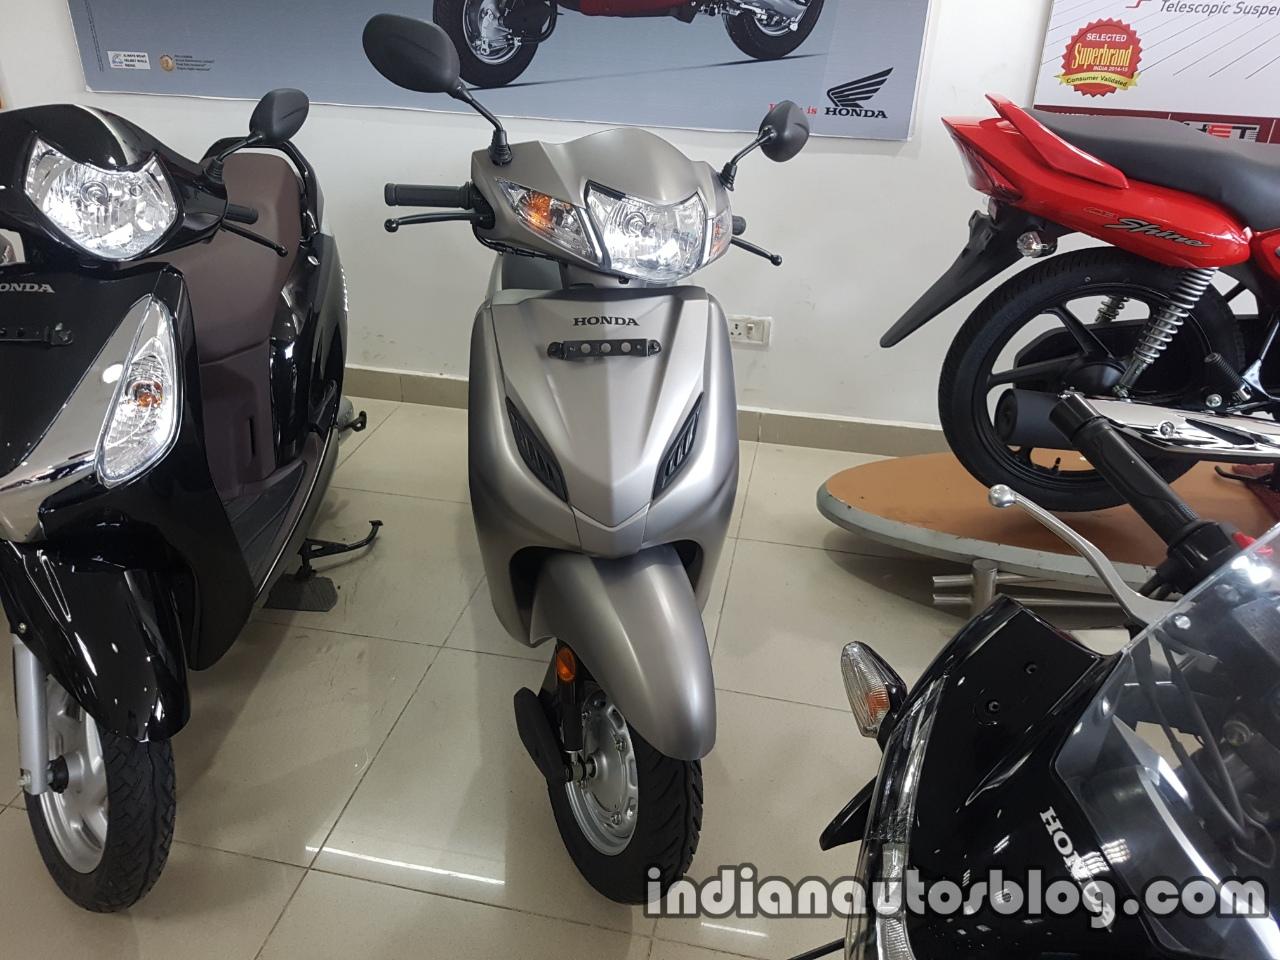 2017 Honda Activa 4G BSIV reaches dealership front